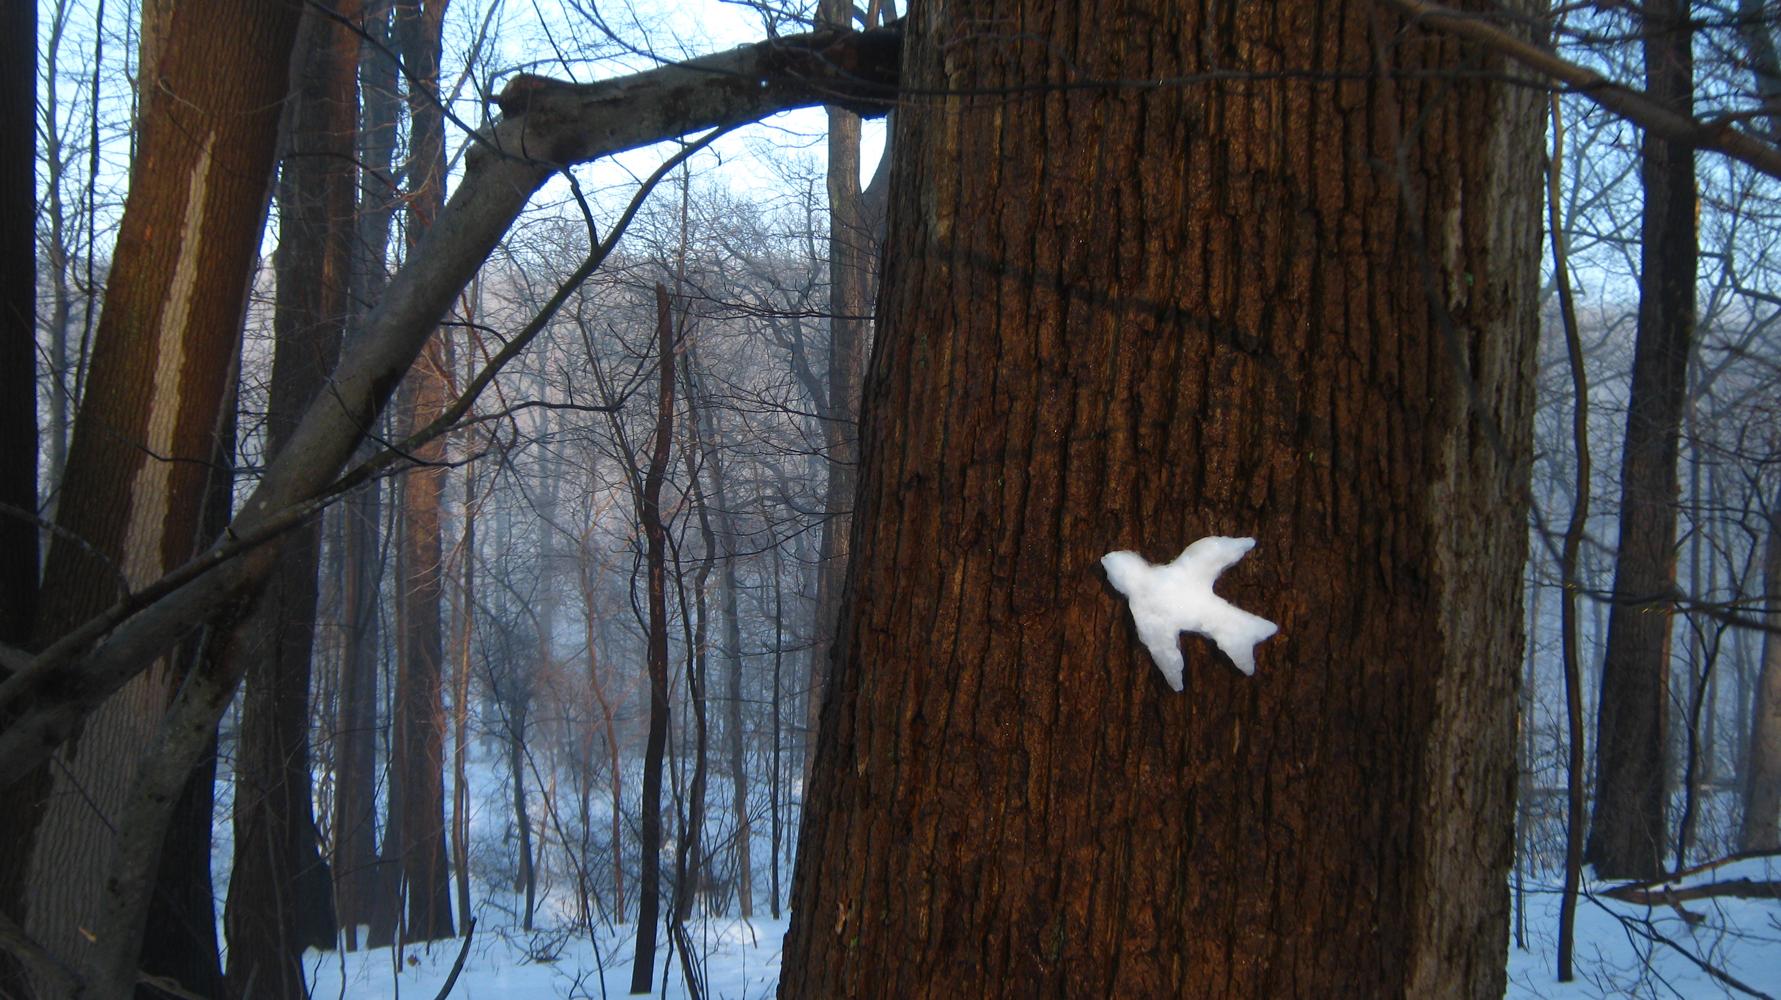 "Barbara Roux, Snow Bird, 2014, Digital print of Roux's site sculpture, 13 x 19"""